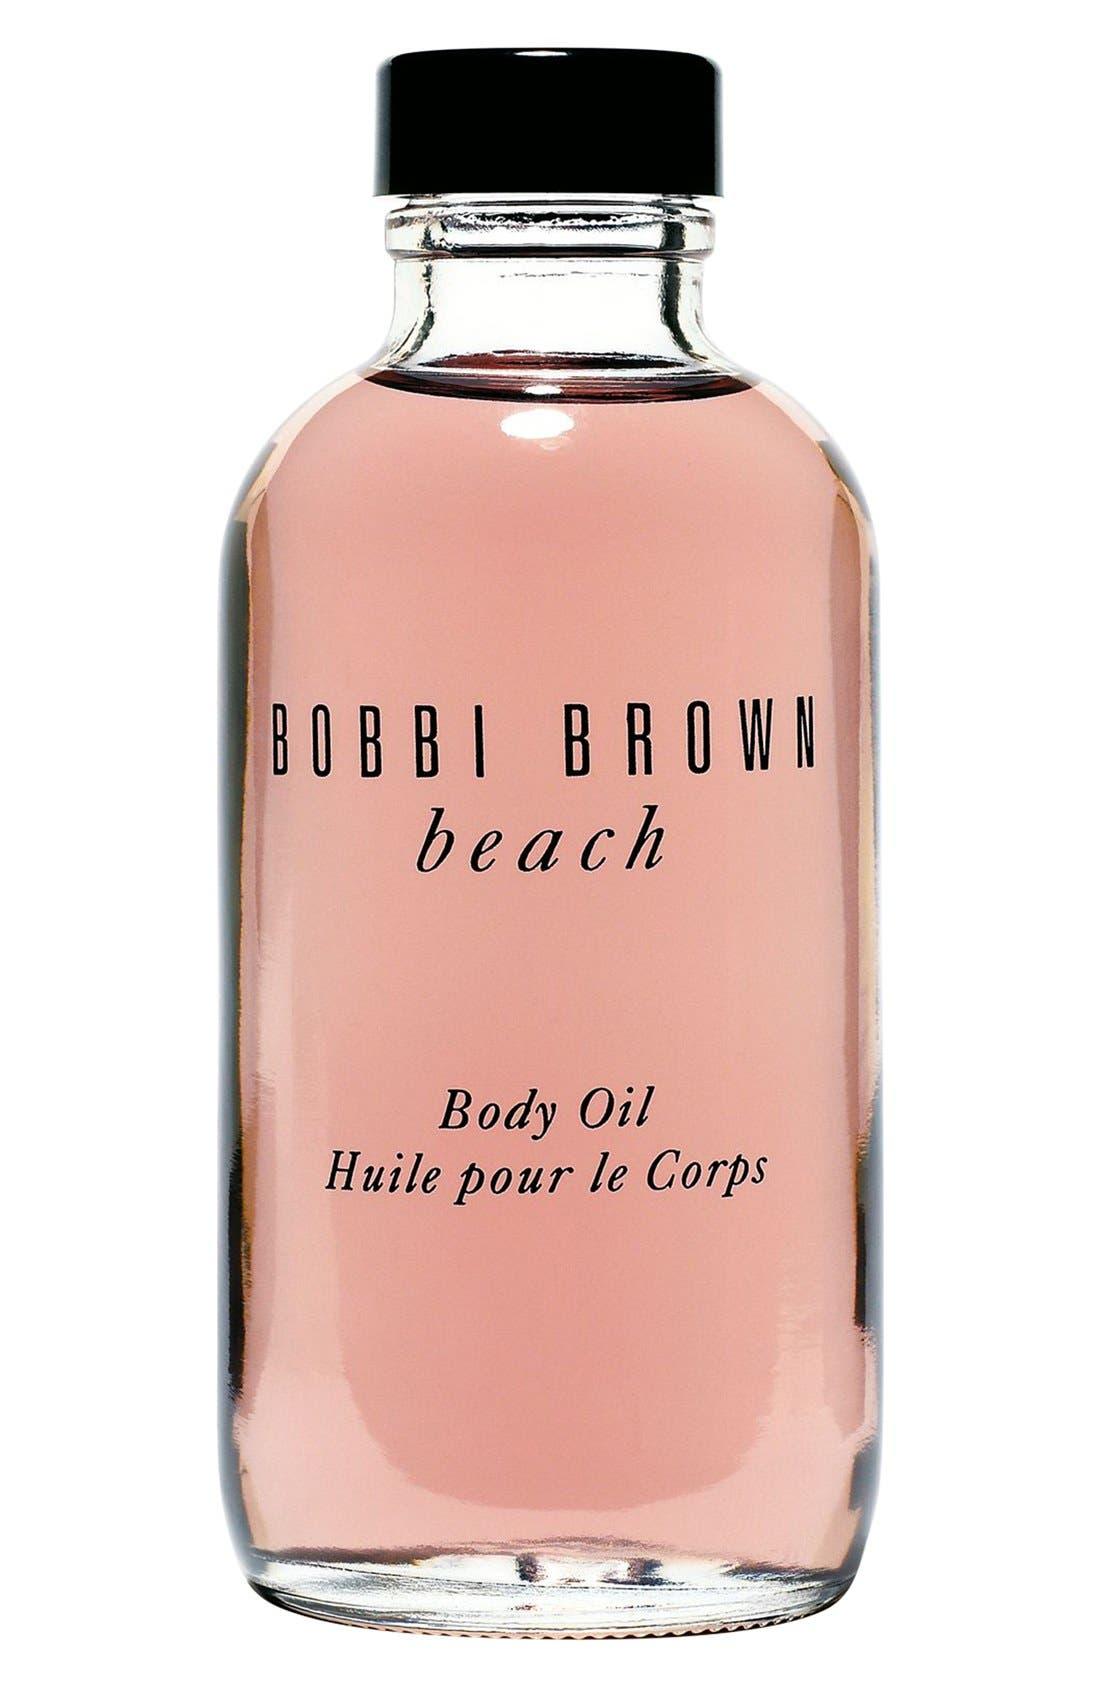 BOBBI BROWN, 'beach' Body Oil, Main thumbnail 1, color, 000